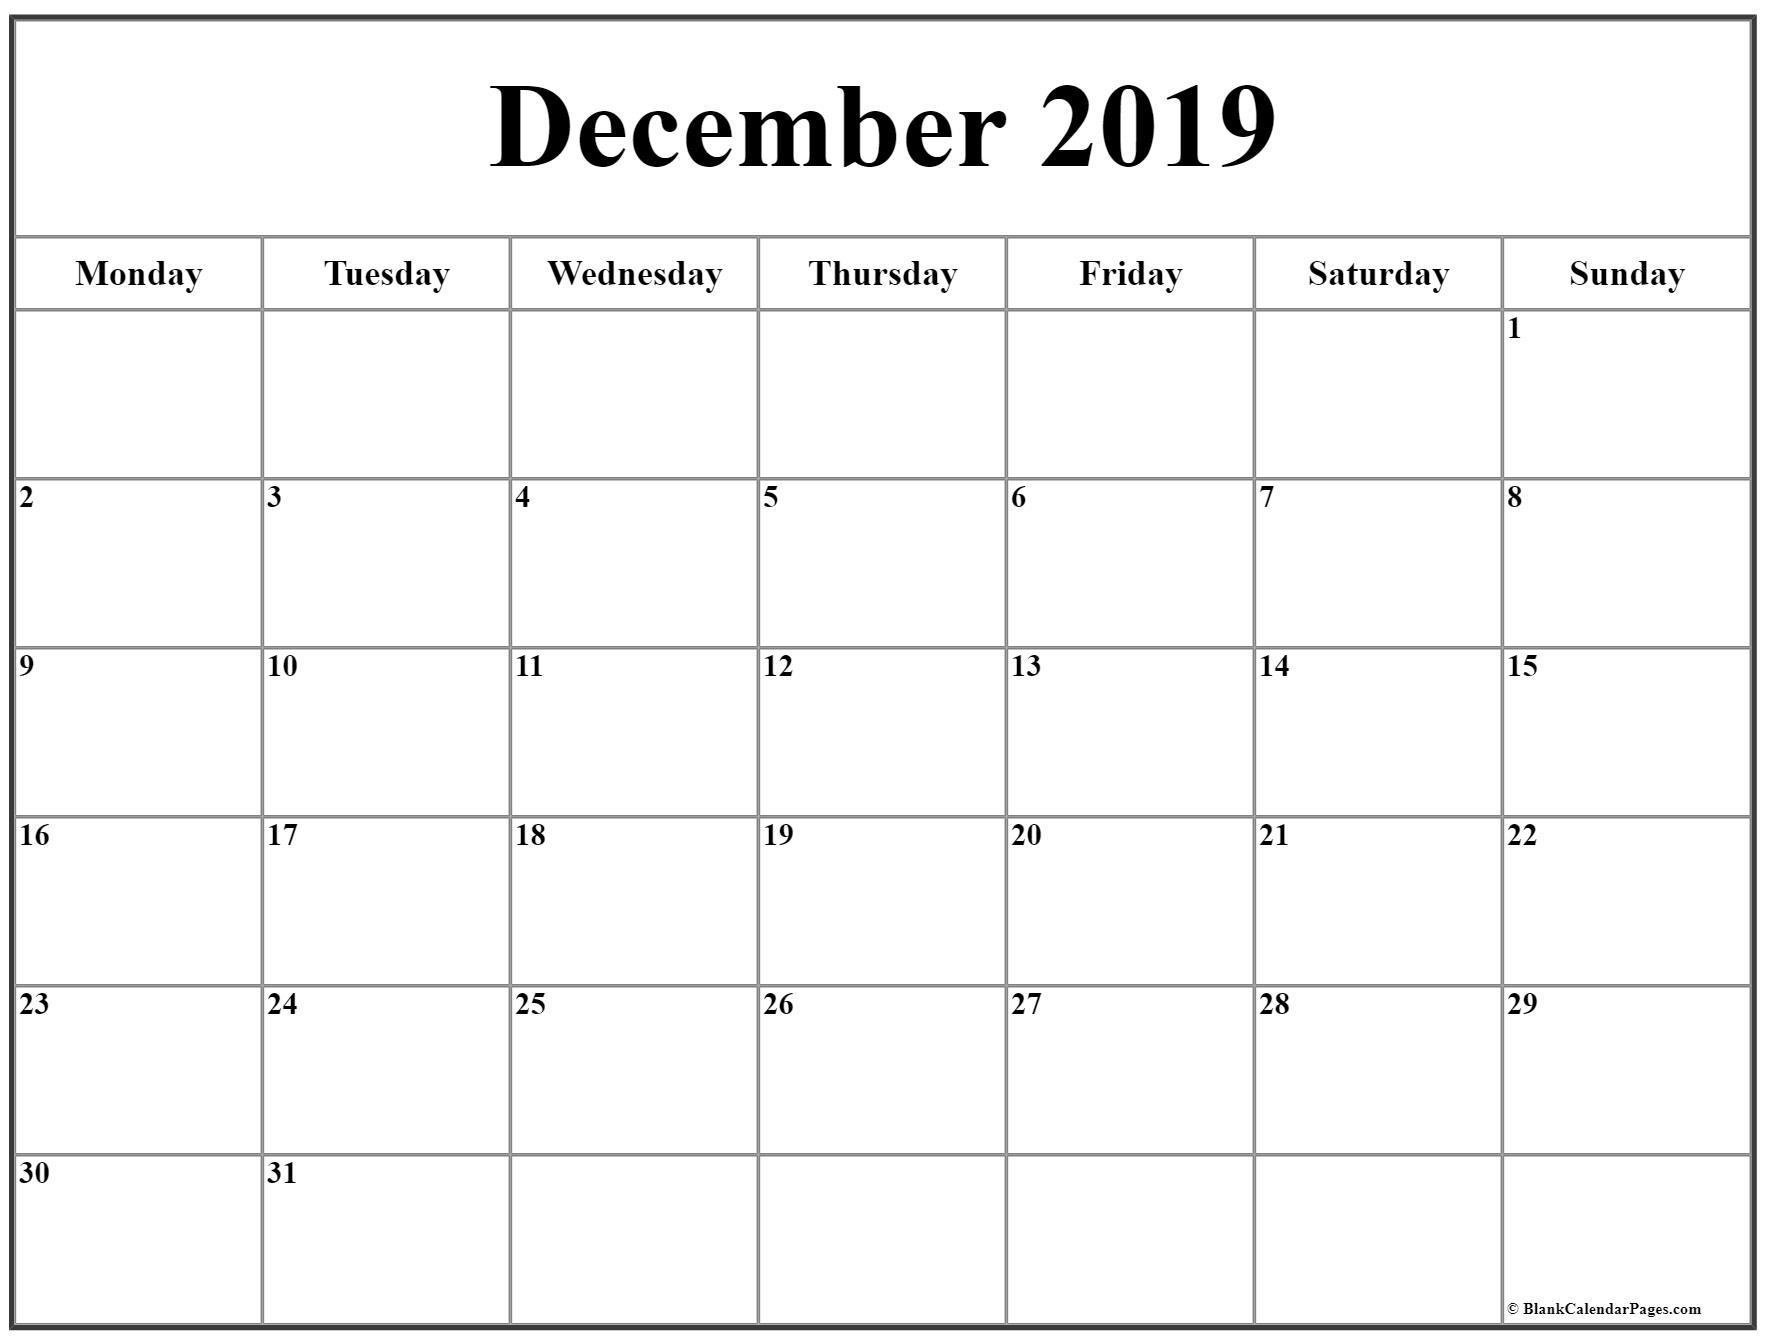 December 2019 Monday Calendar | Monday To Sunday inside Calendar 2019 Monday To Sunday